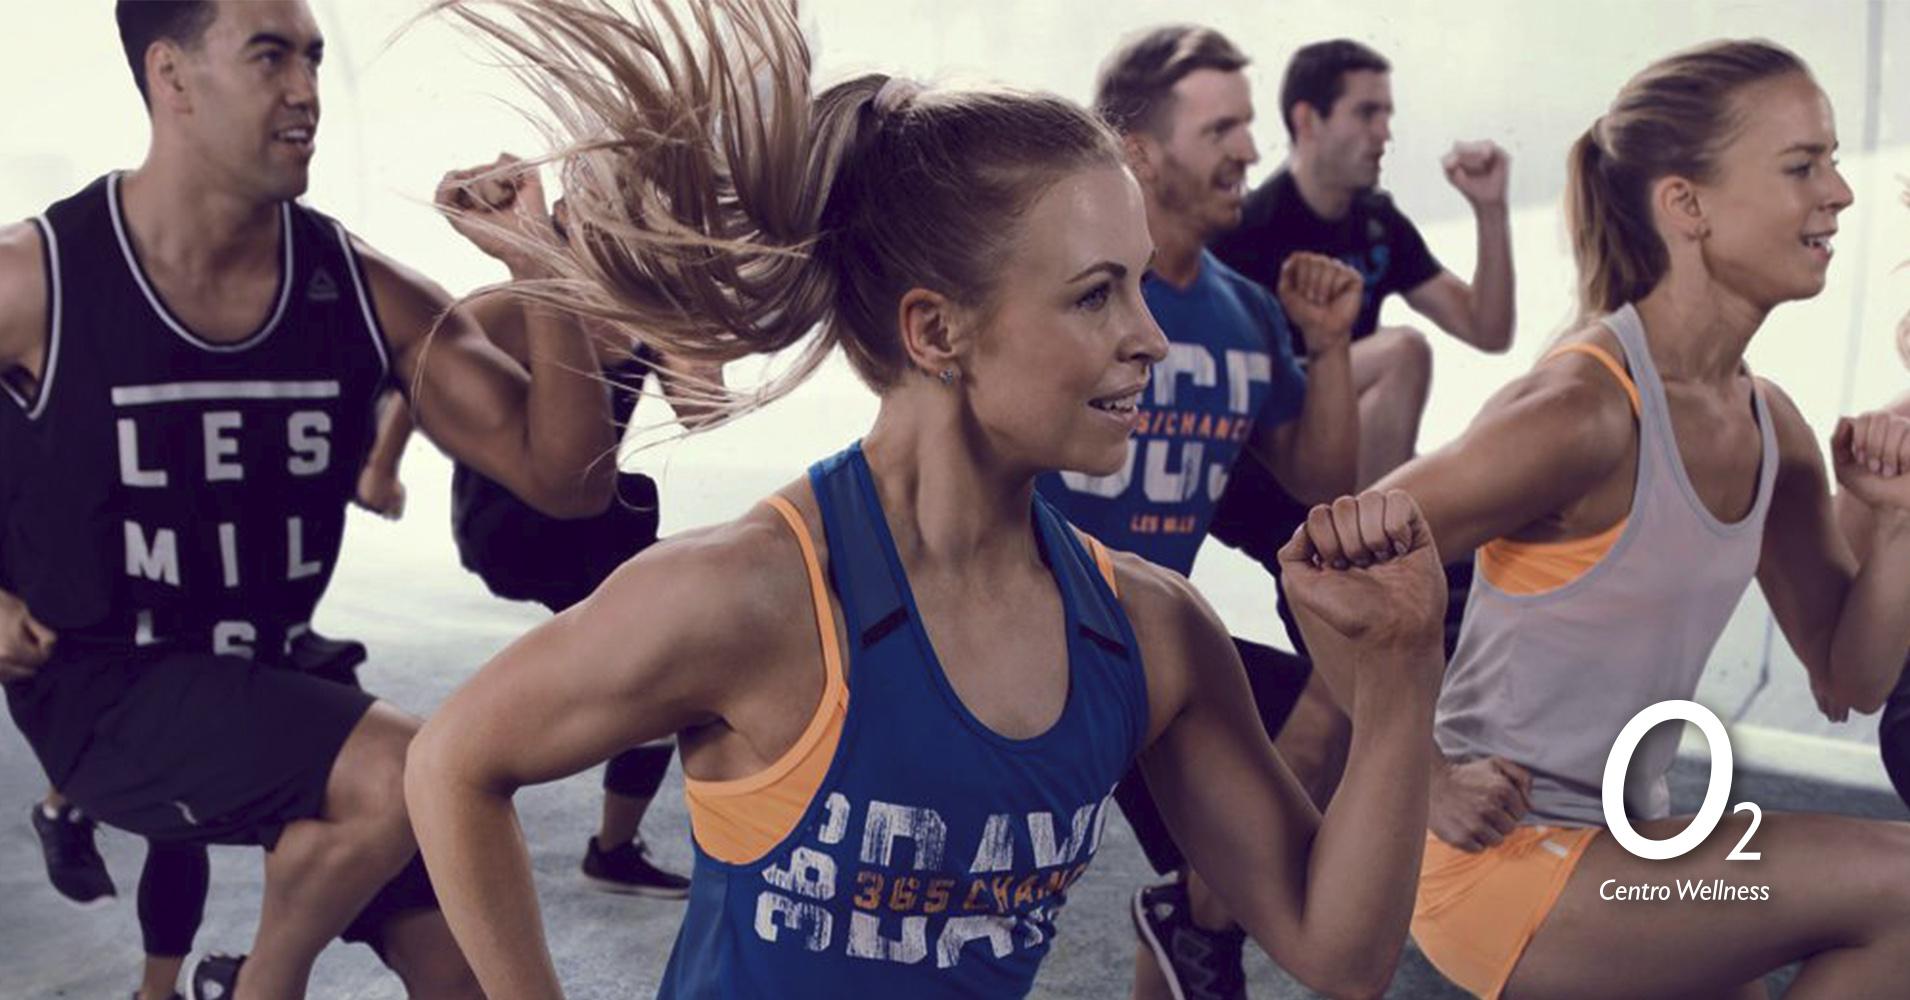 o2cw eventos lesmills sala fitness entrenamiento body attack